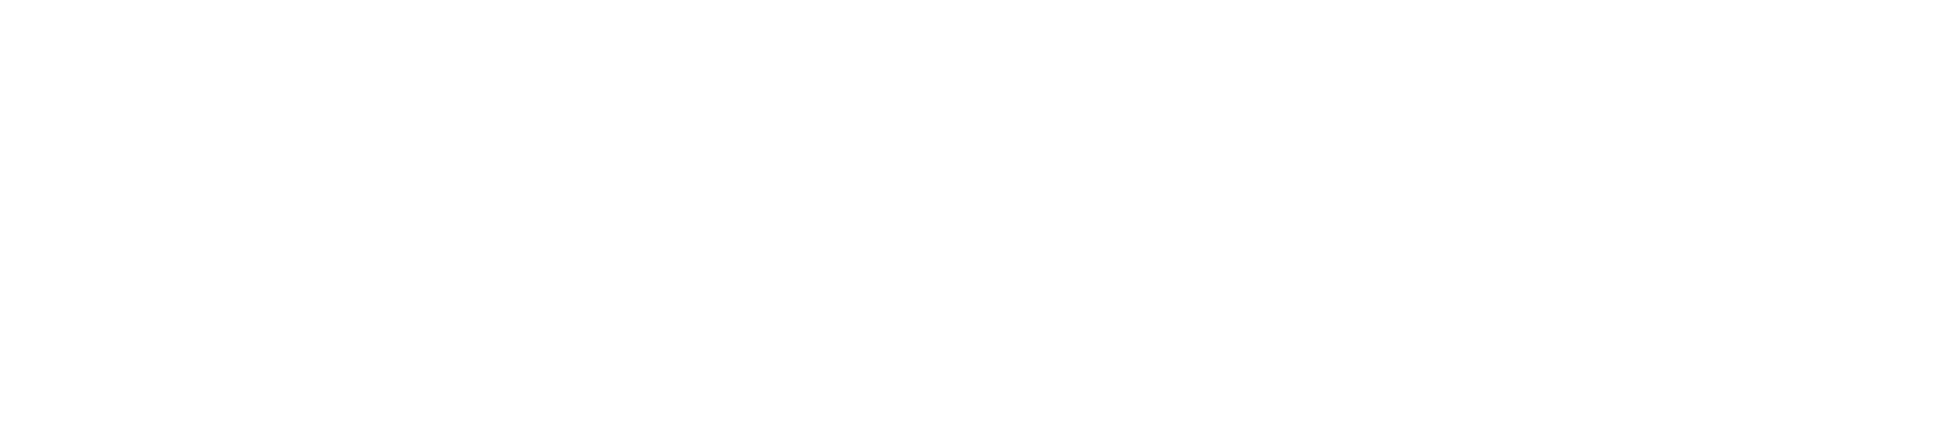 Yukon Liberals